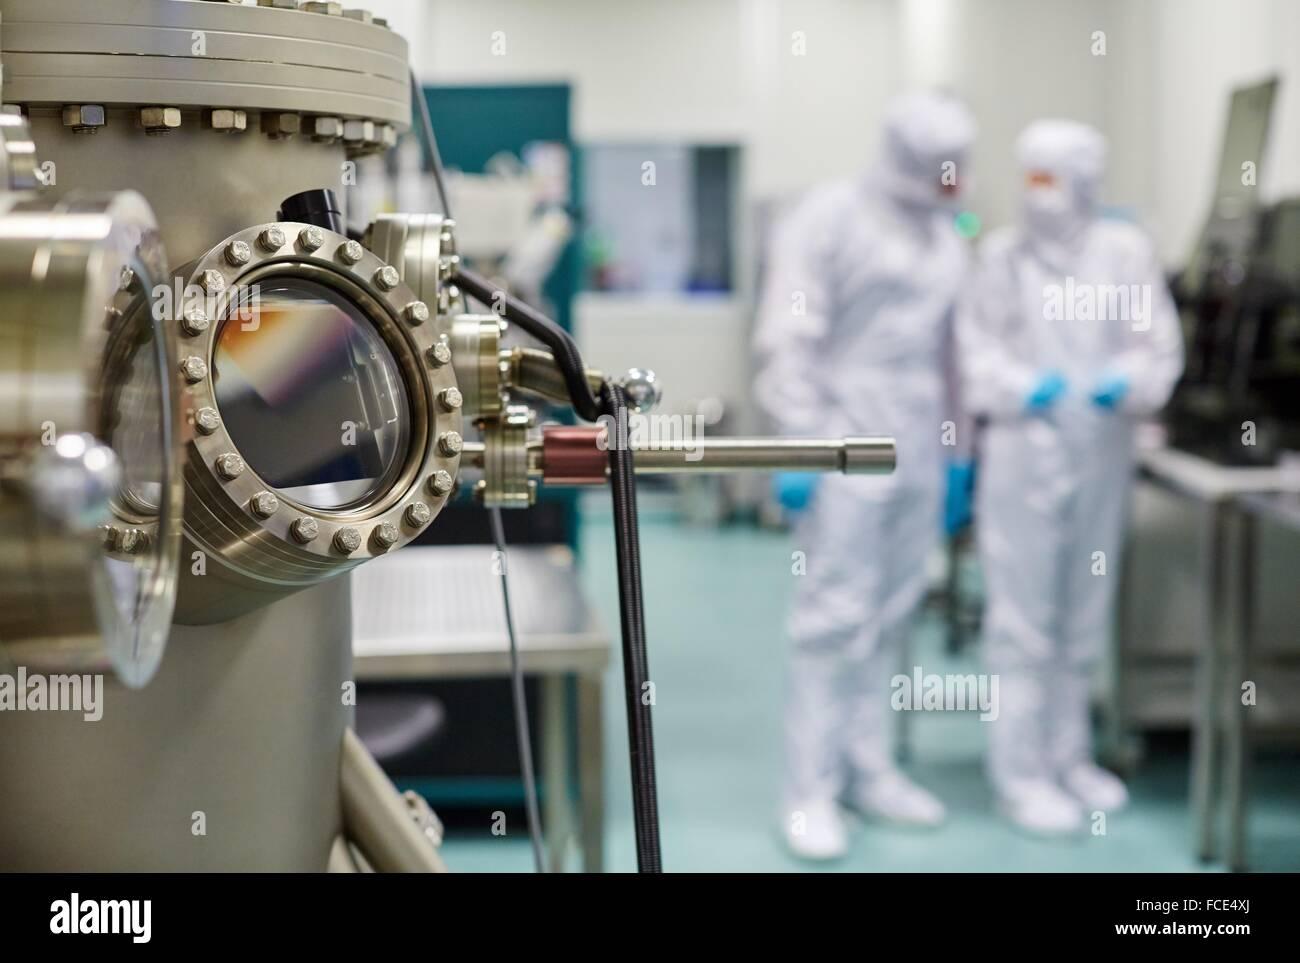 Createc UHV deposition system  Cleanroom  Nanotechnology